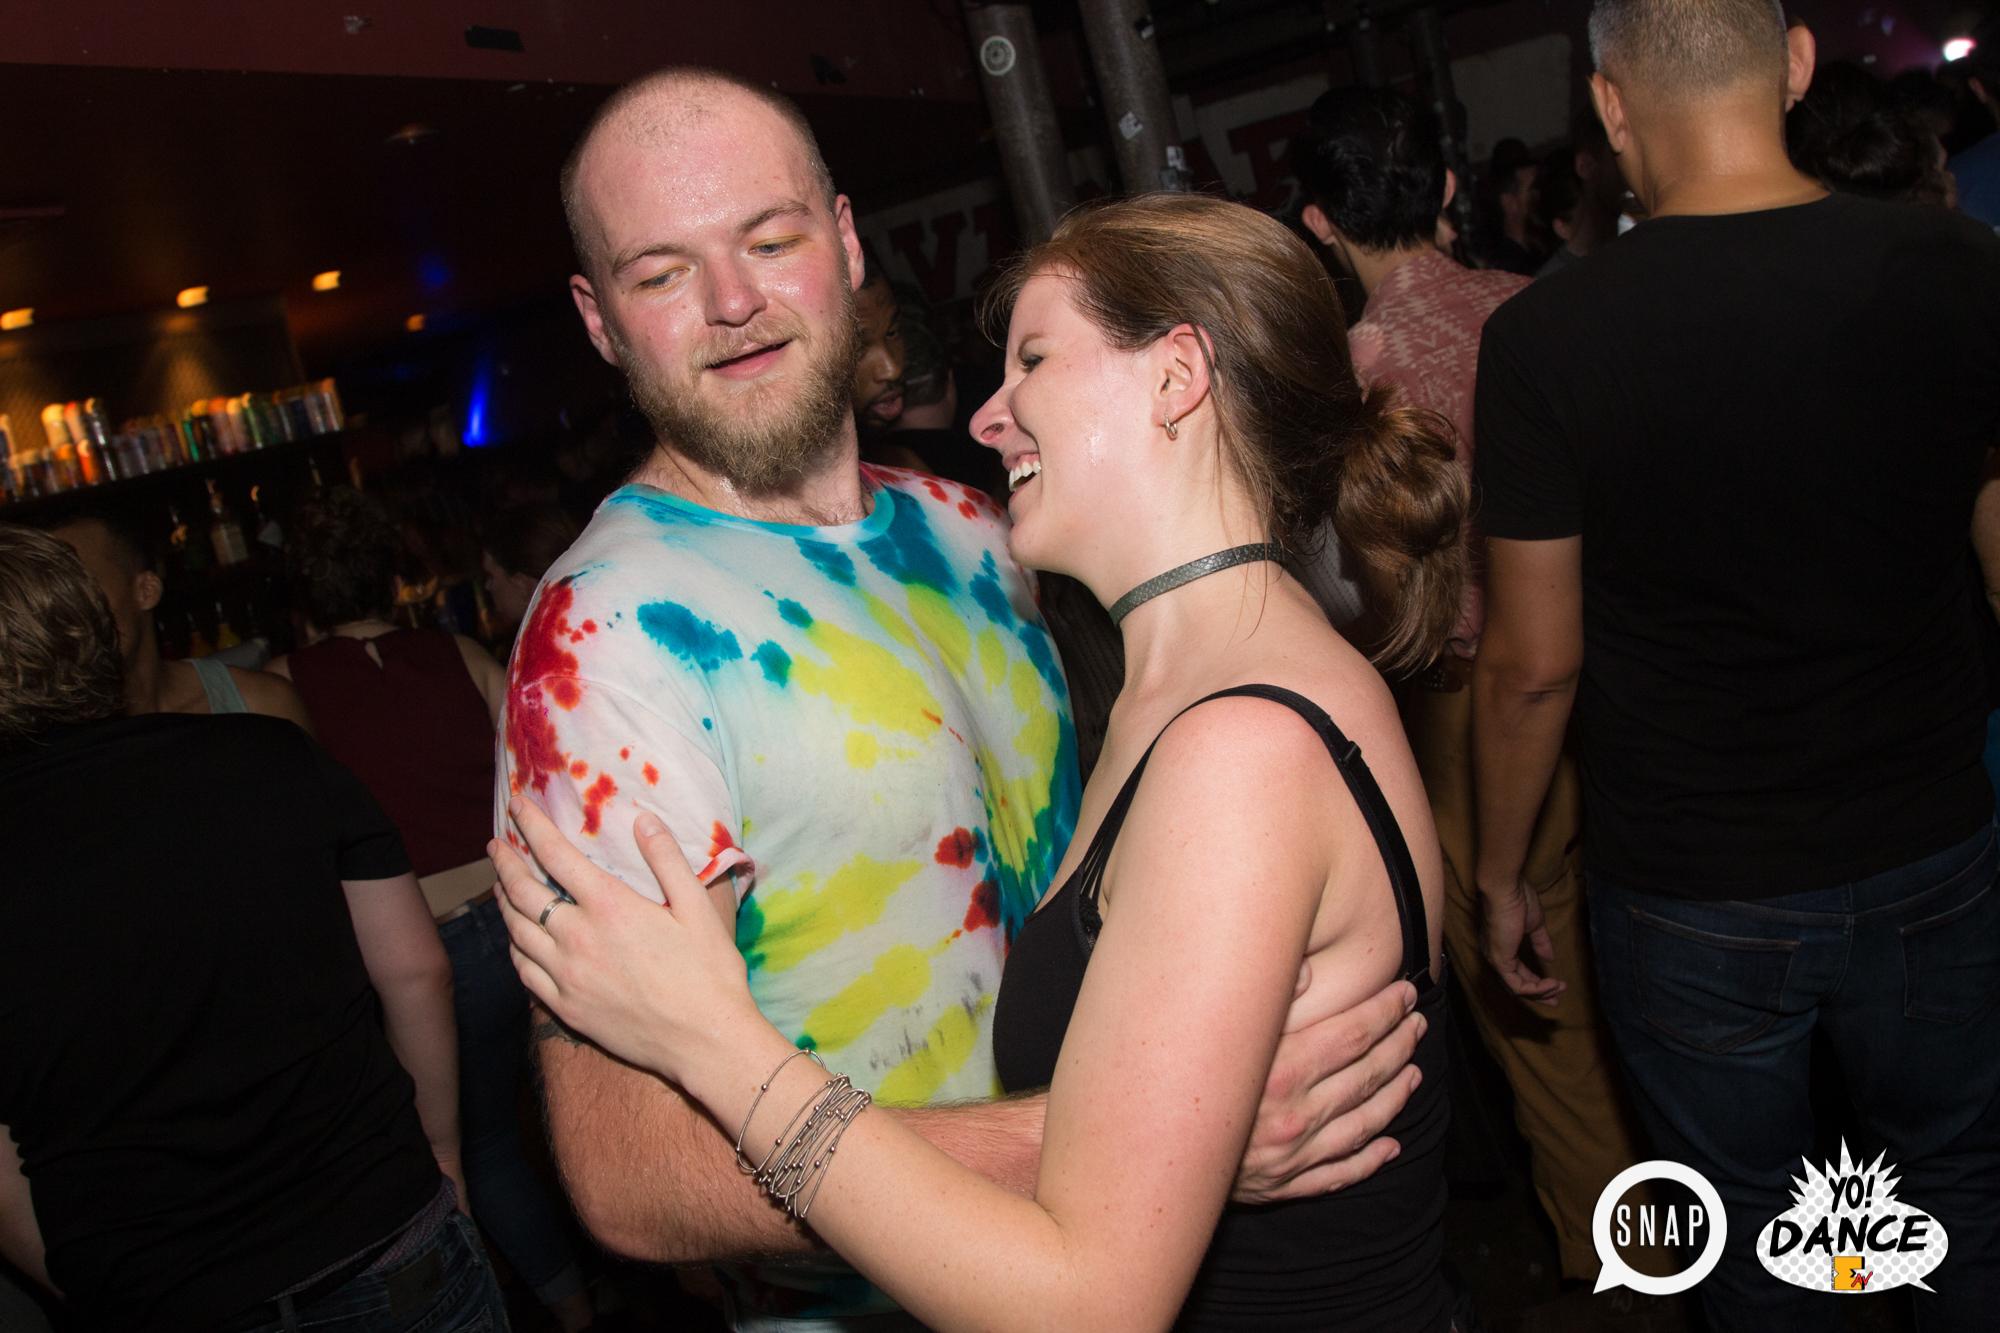 34Yo Dance Oh Snap Kid Atlanta.jpg